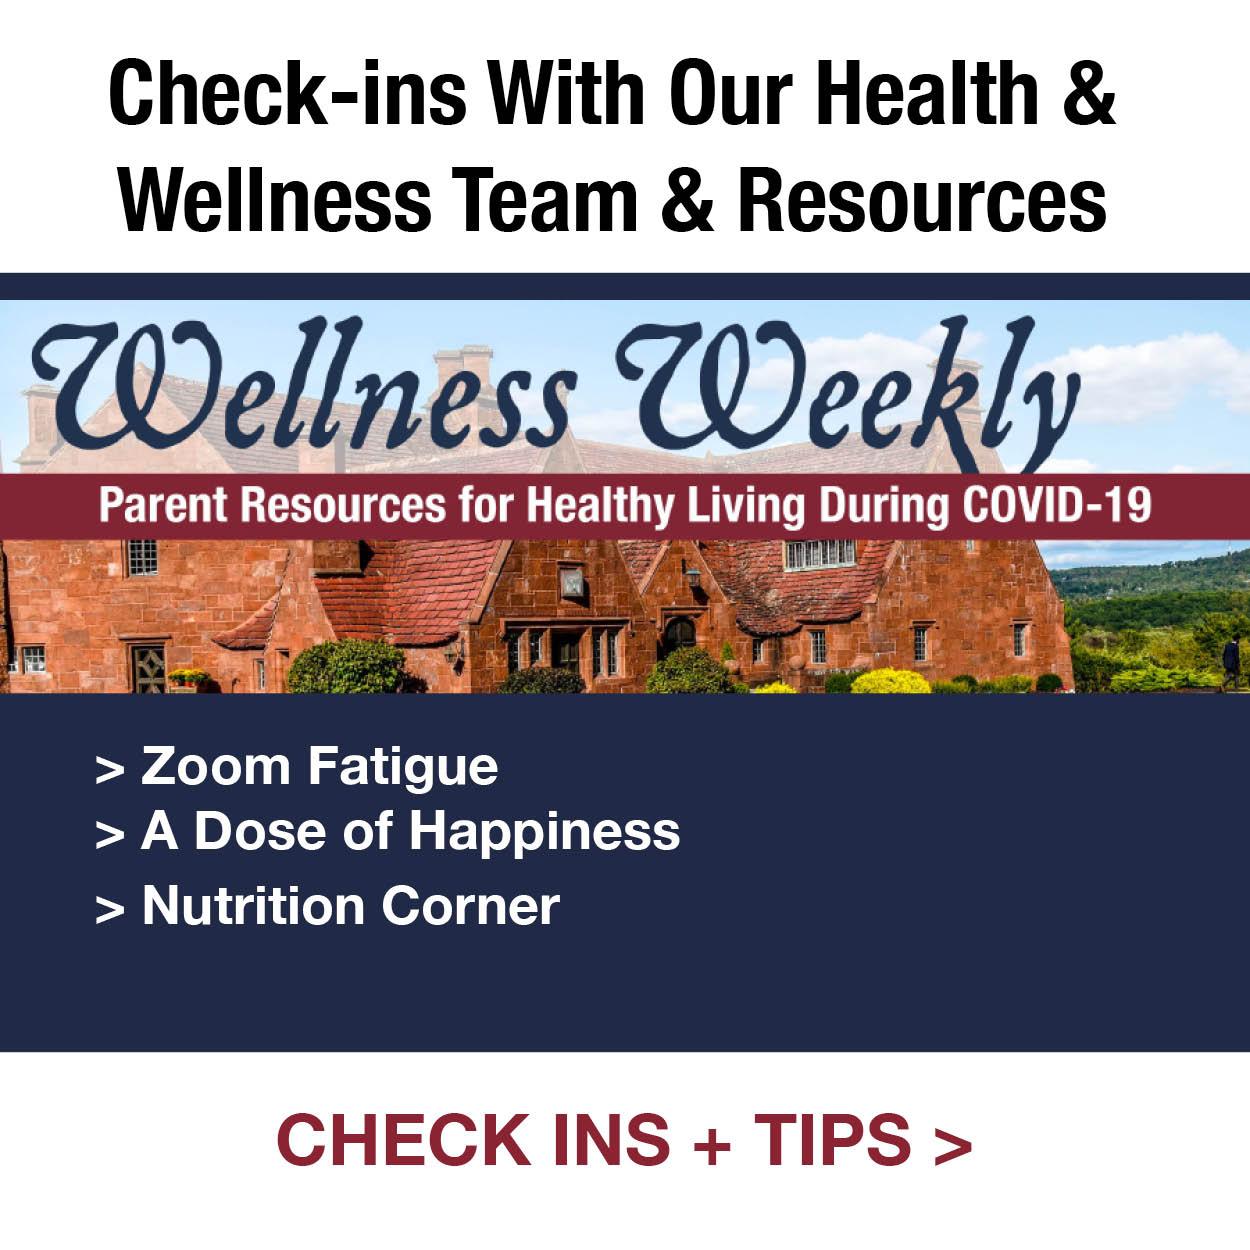 Wellness Weekly